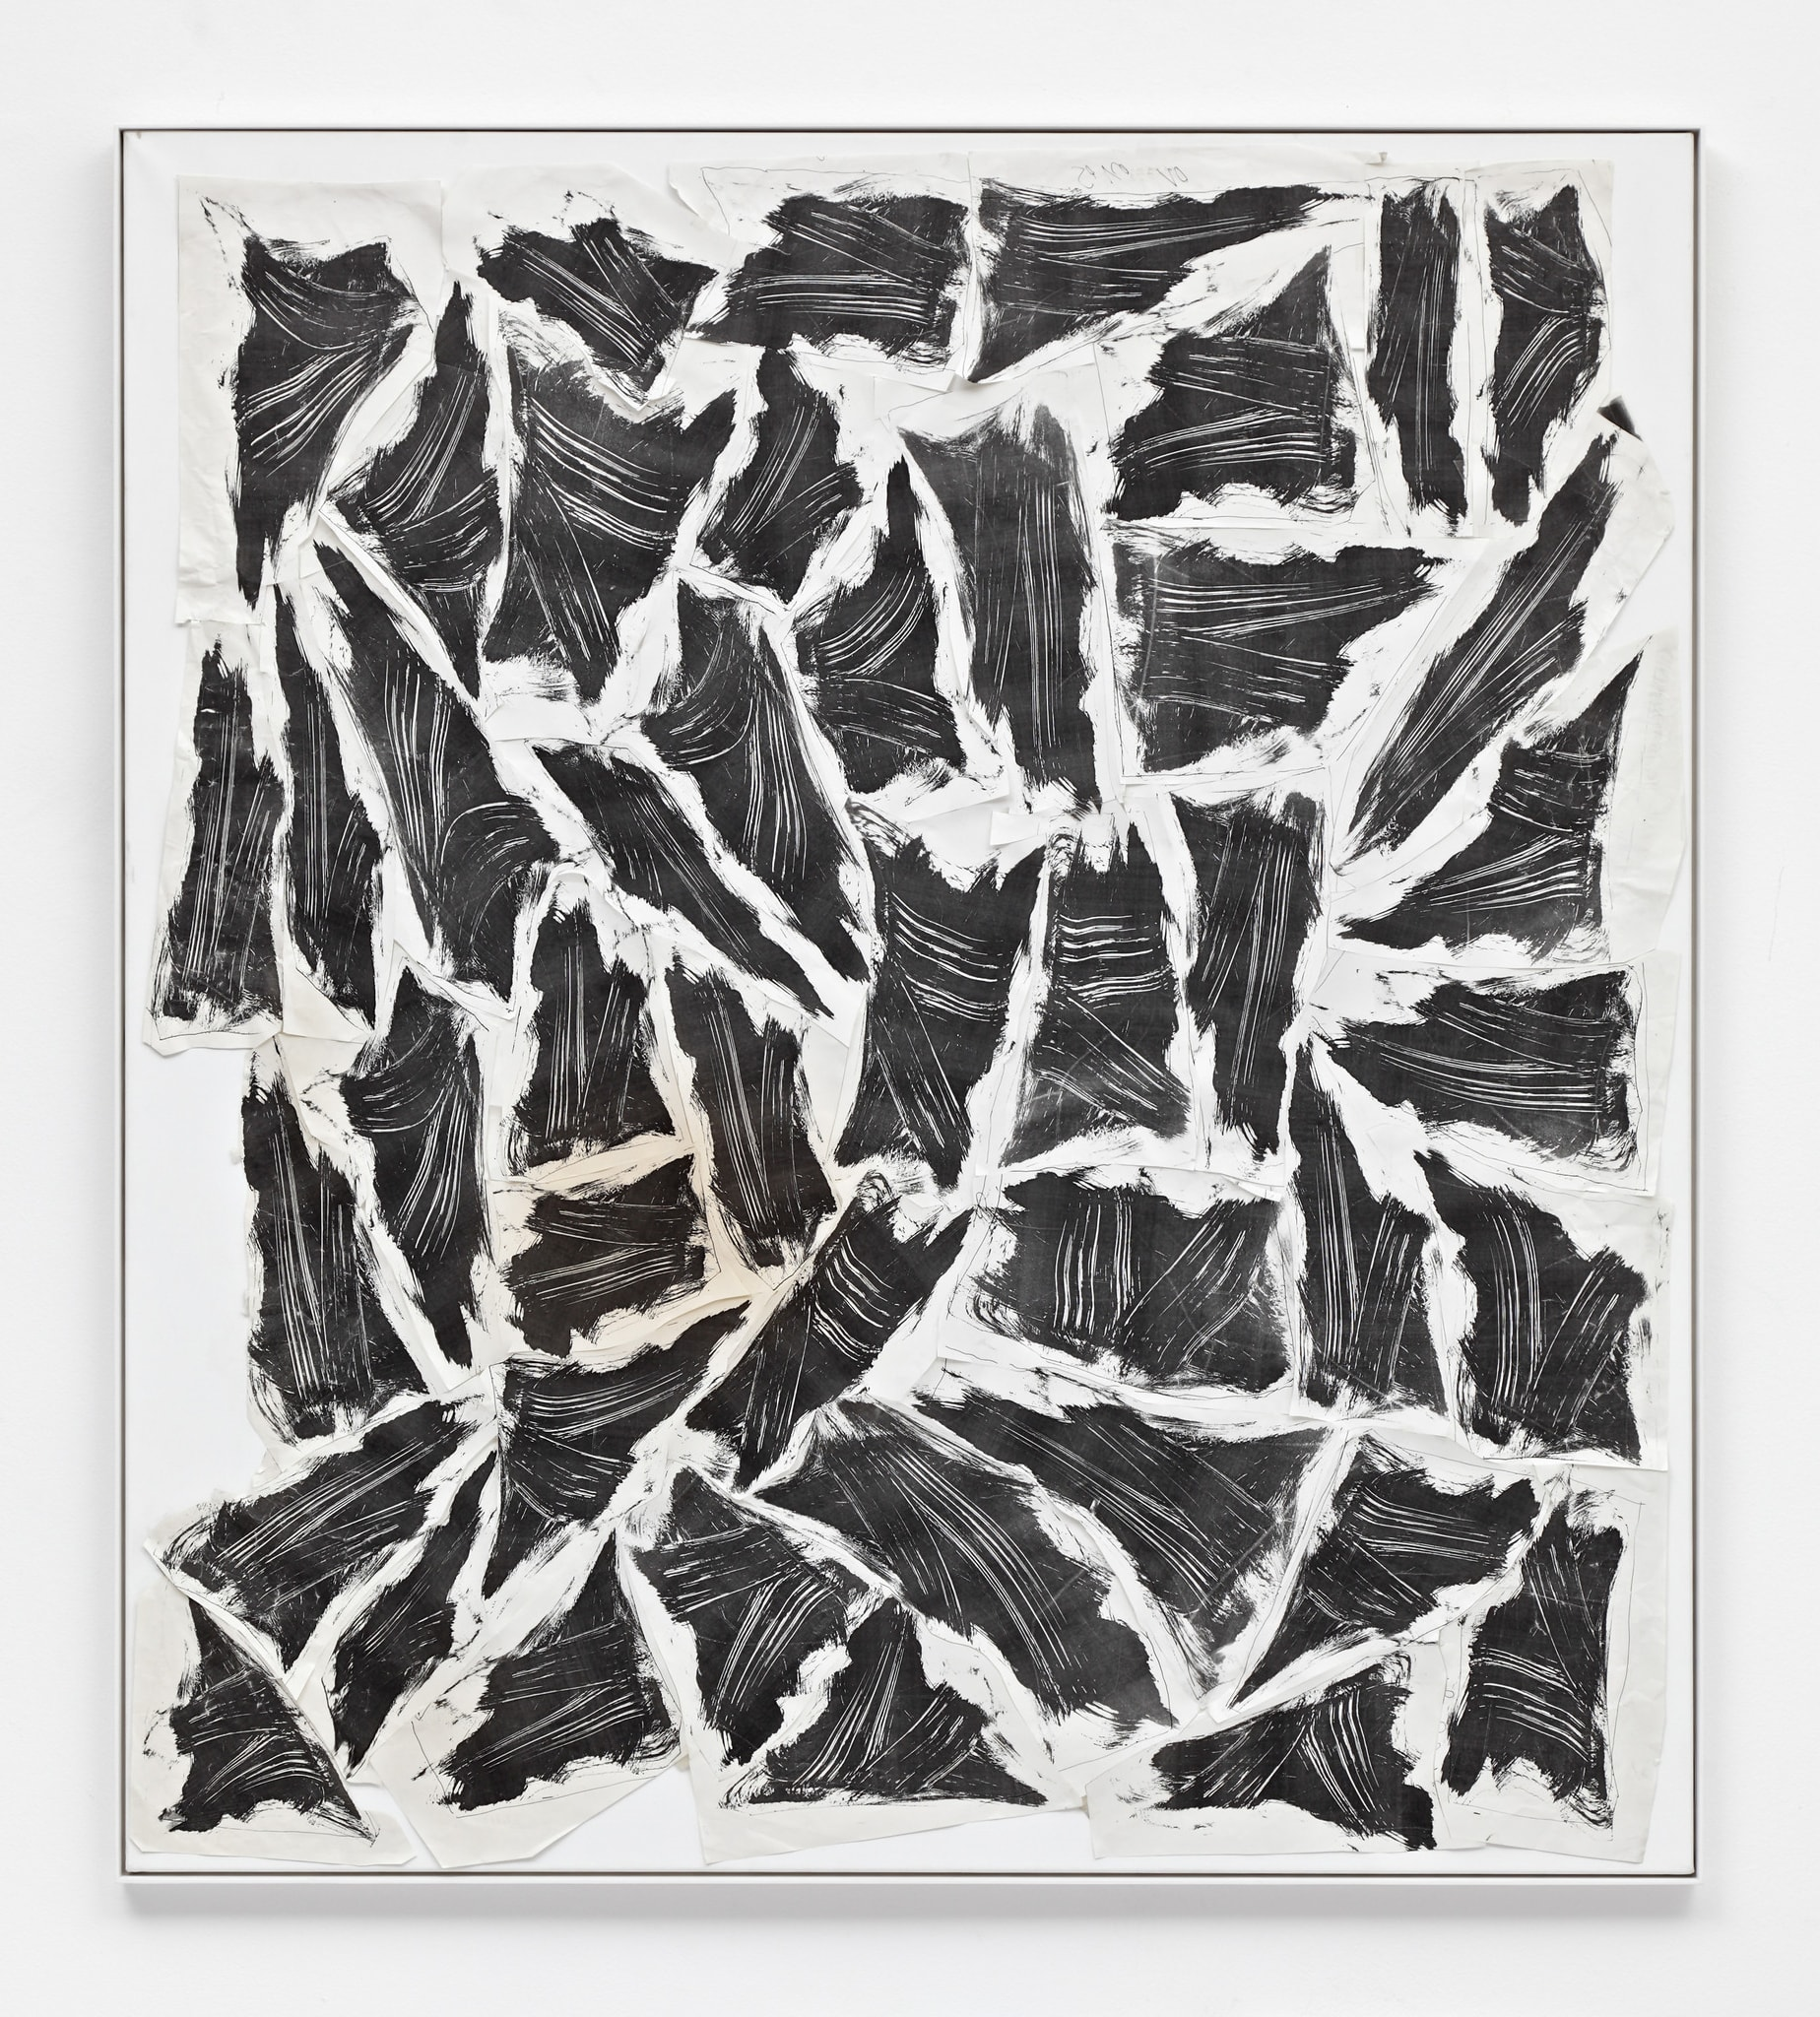 Stückmalerei 1987 45 Varianten by Thomas Bayrle